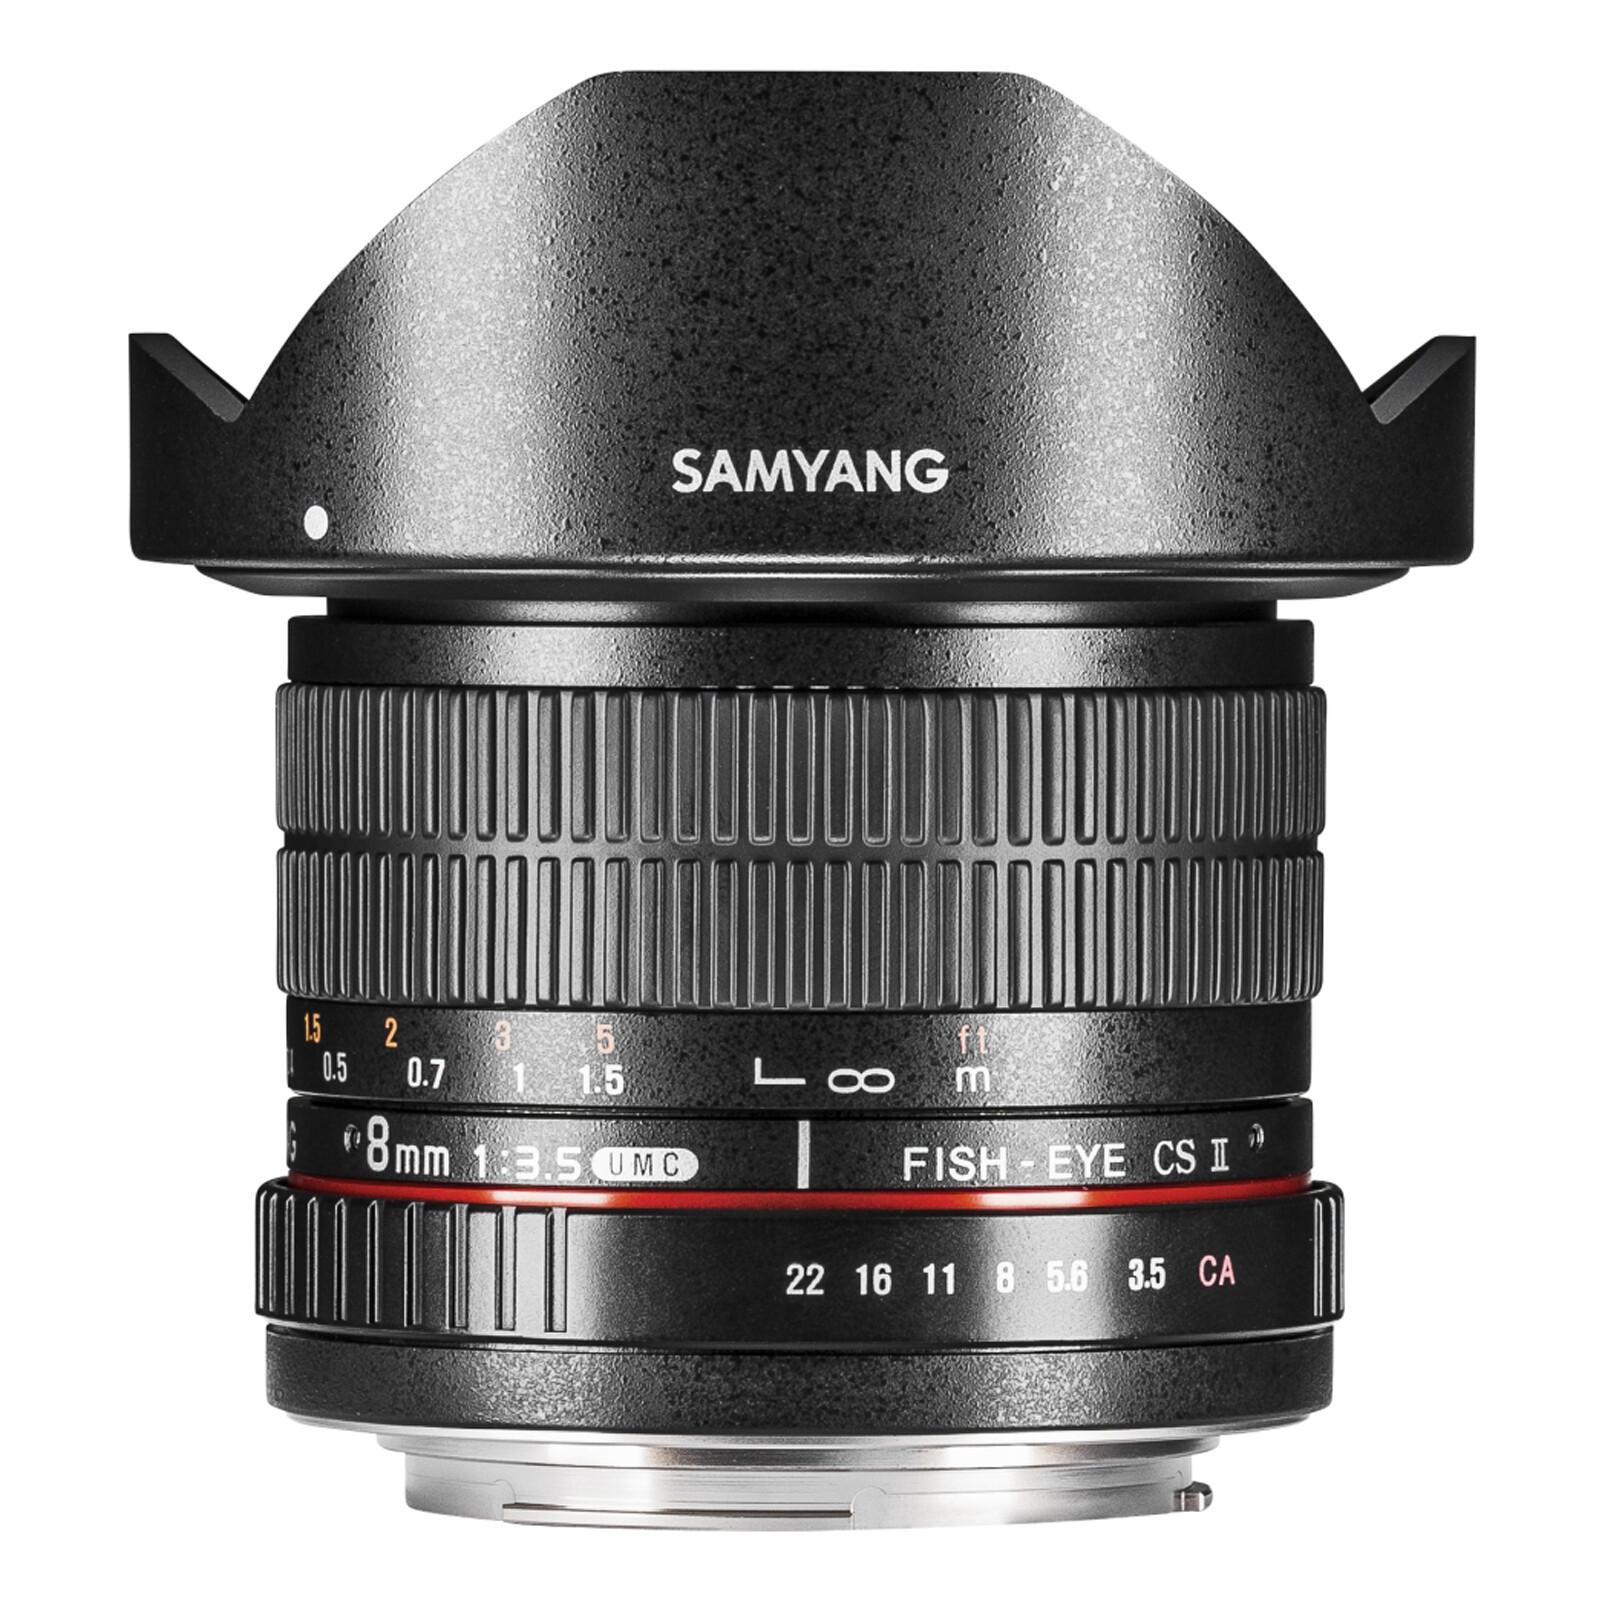 Samyang MF 8/3,5 Fisheye II APS-C Fuji X